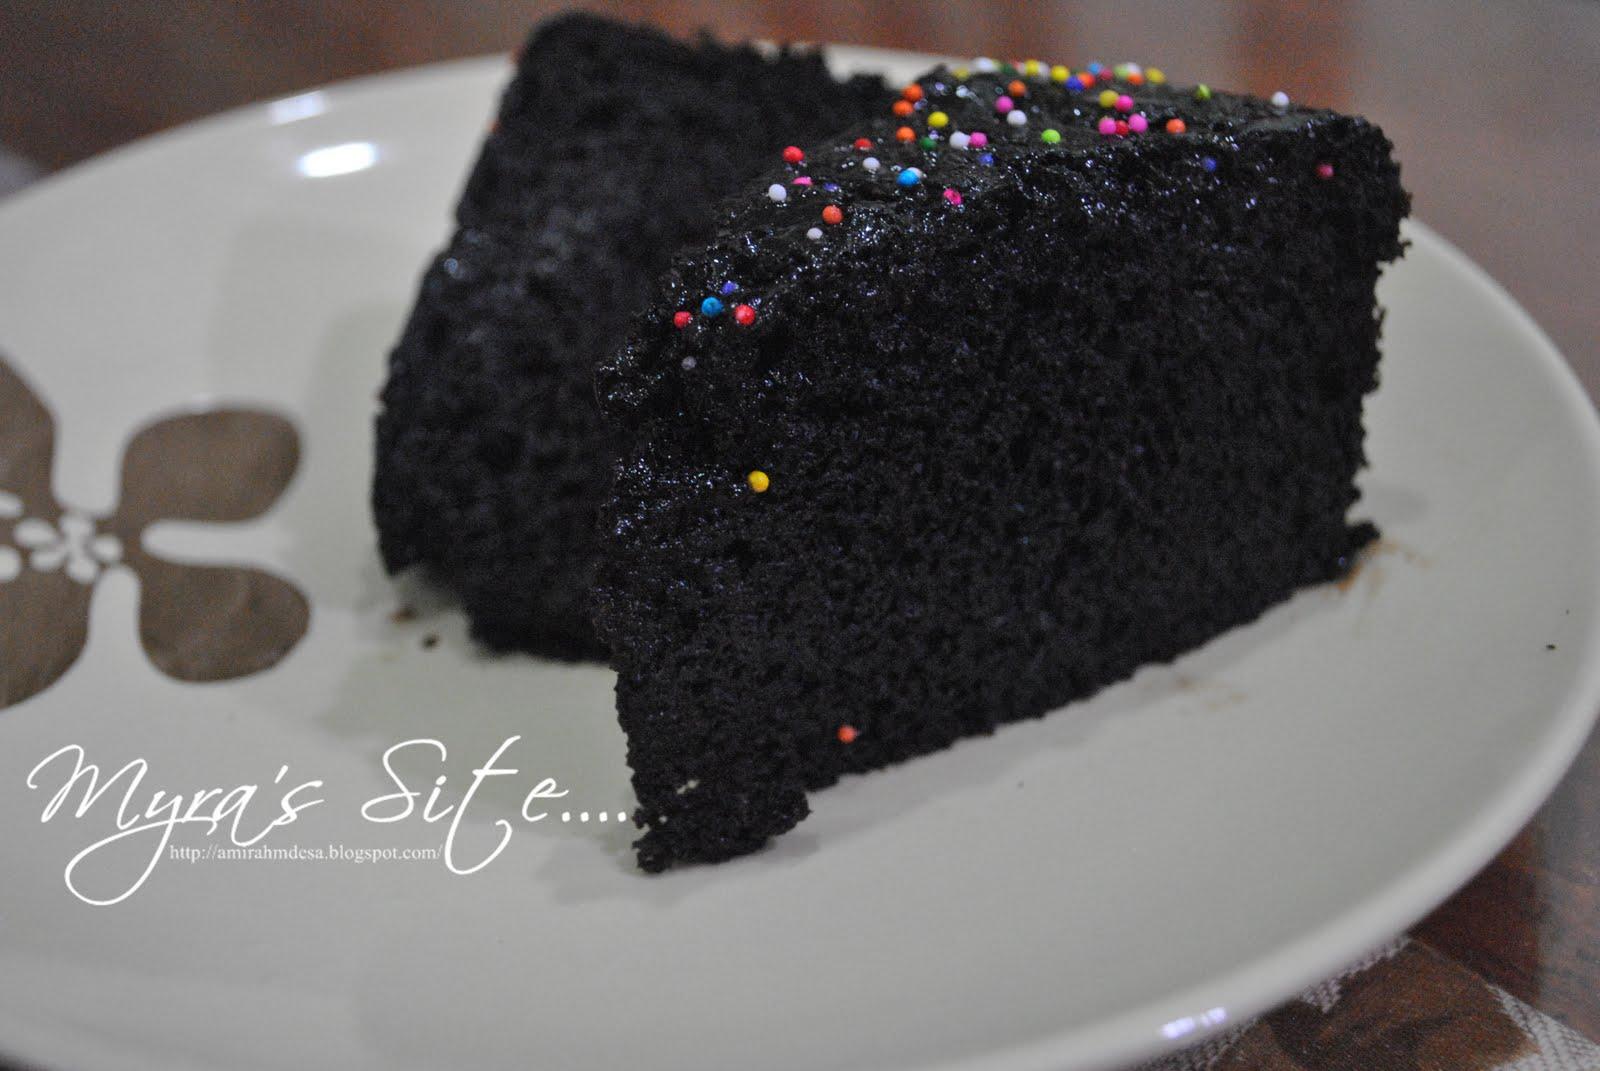 Cara Buat Kek Cake Ideas and Designs